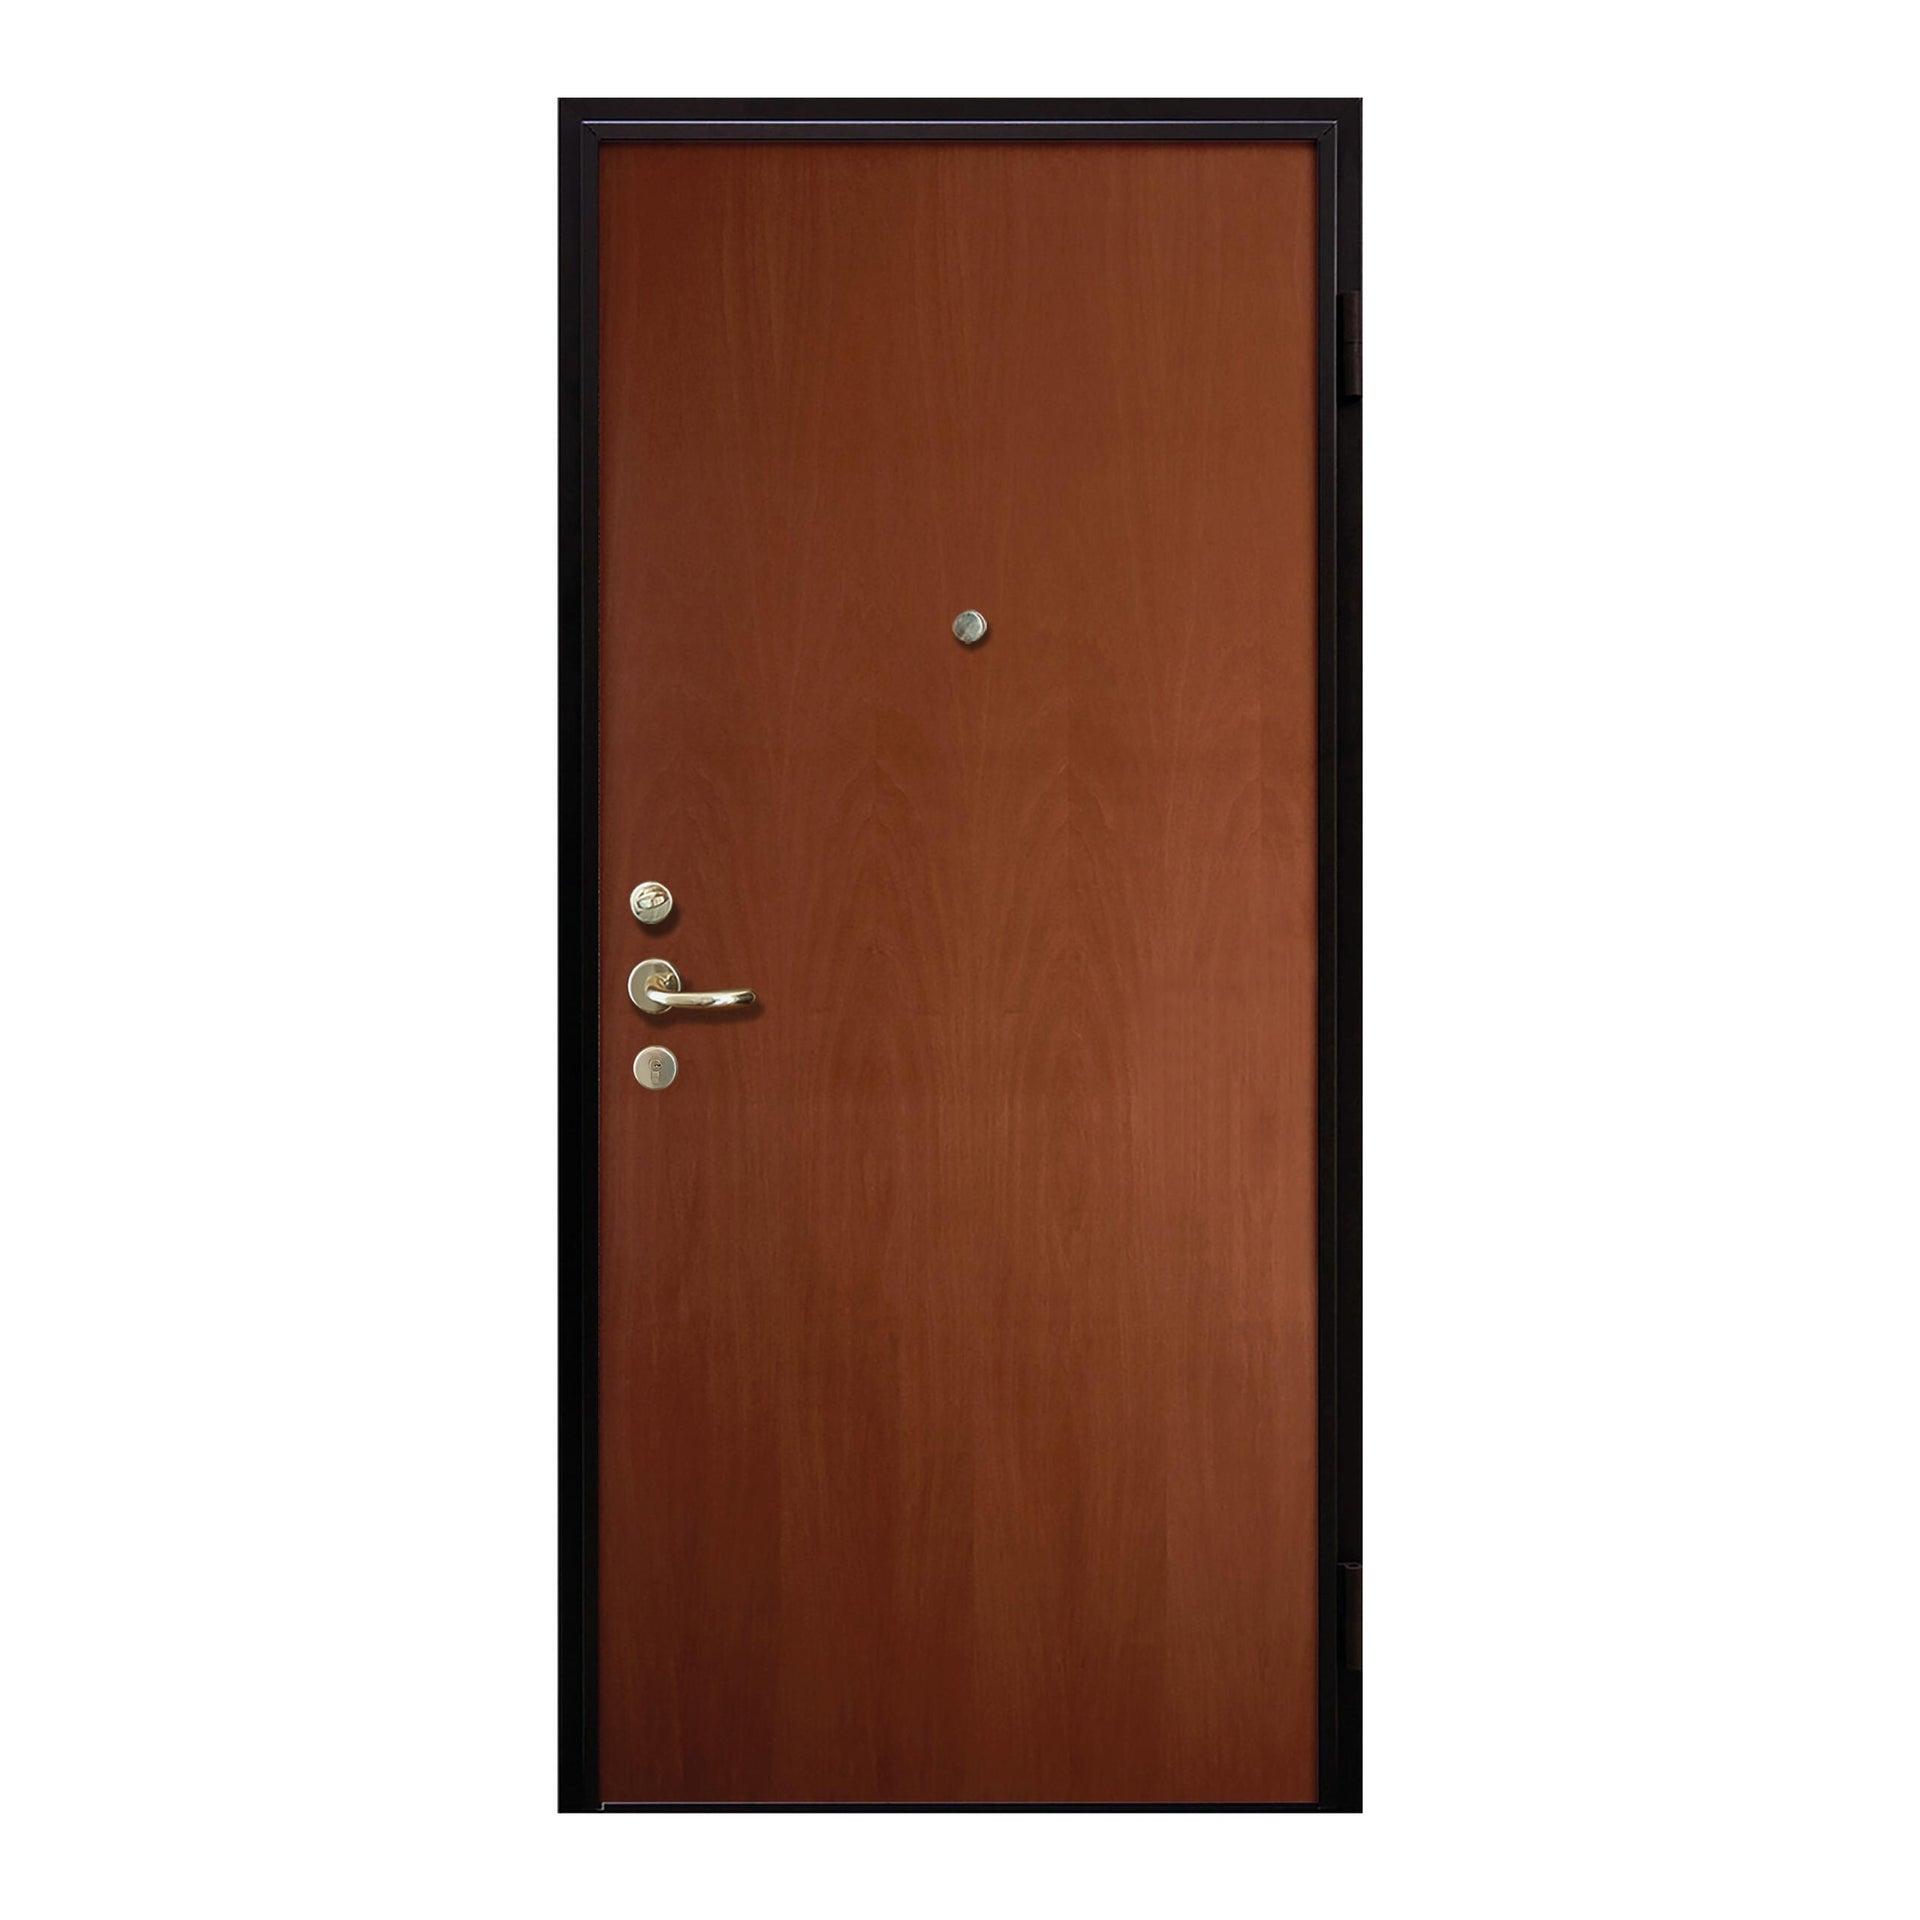 Porta blindata Best noce L 80 x H 210 cm sinistra - 6